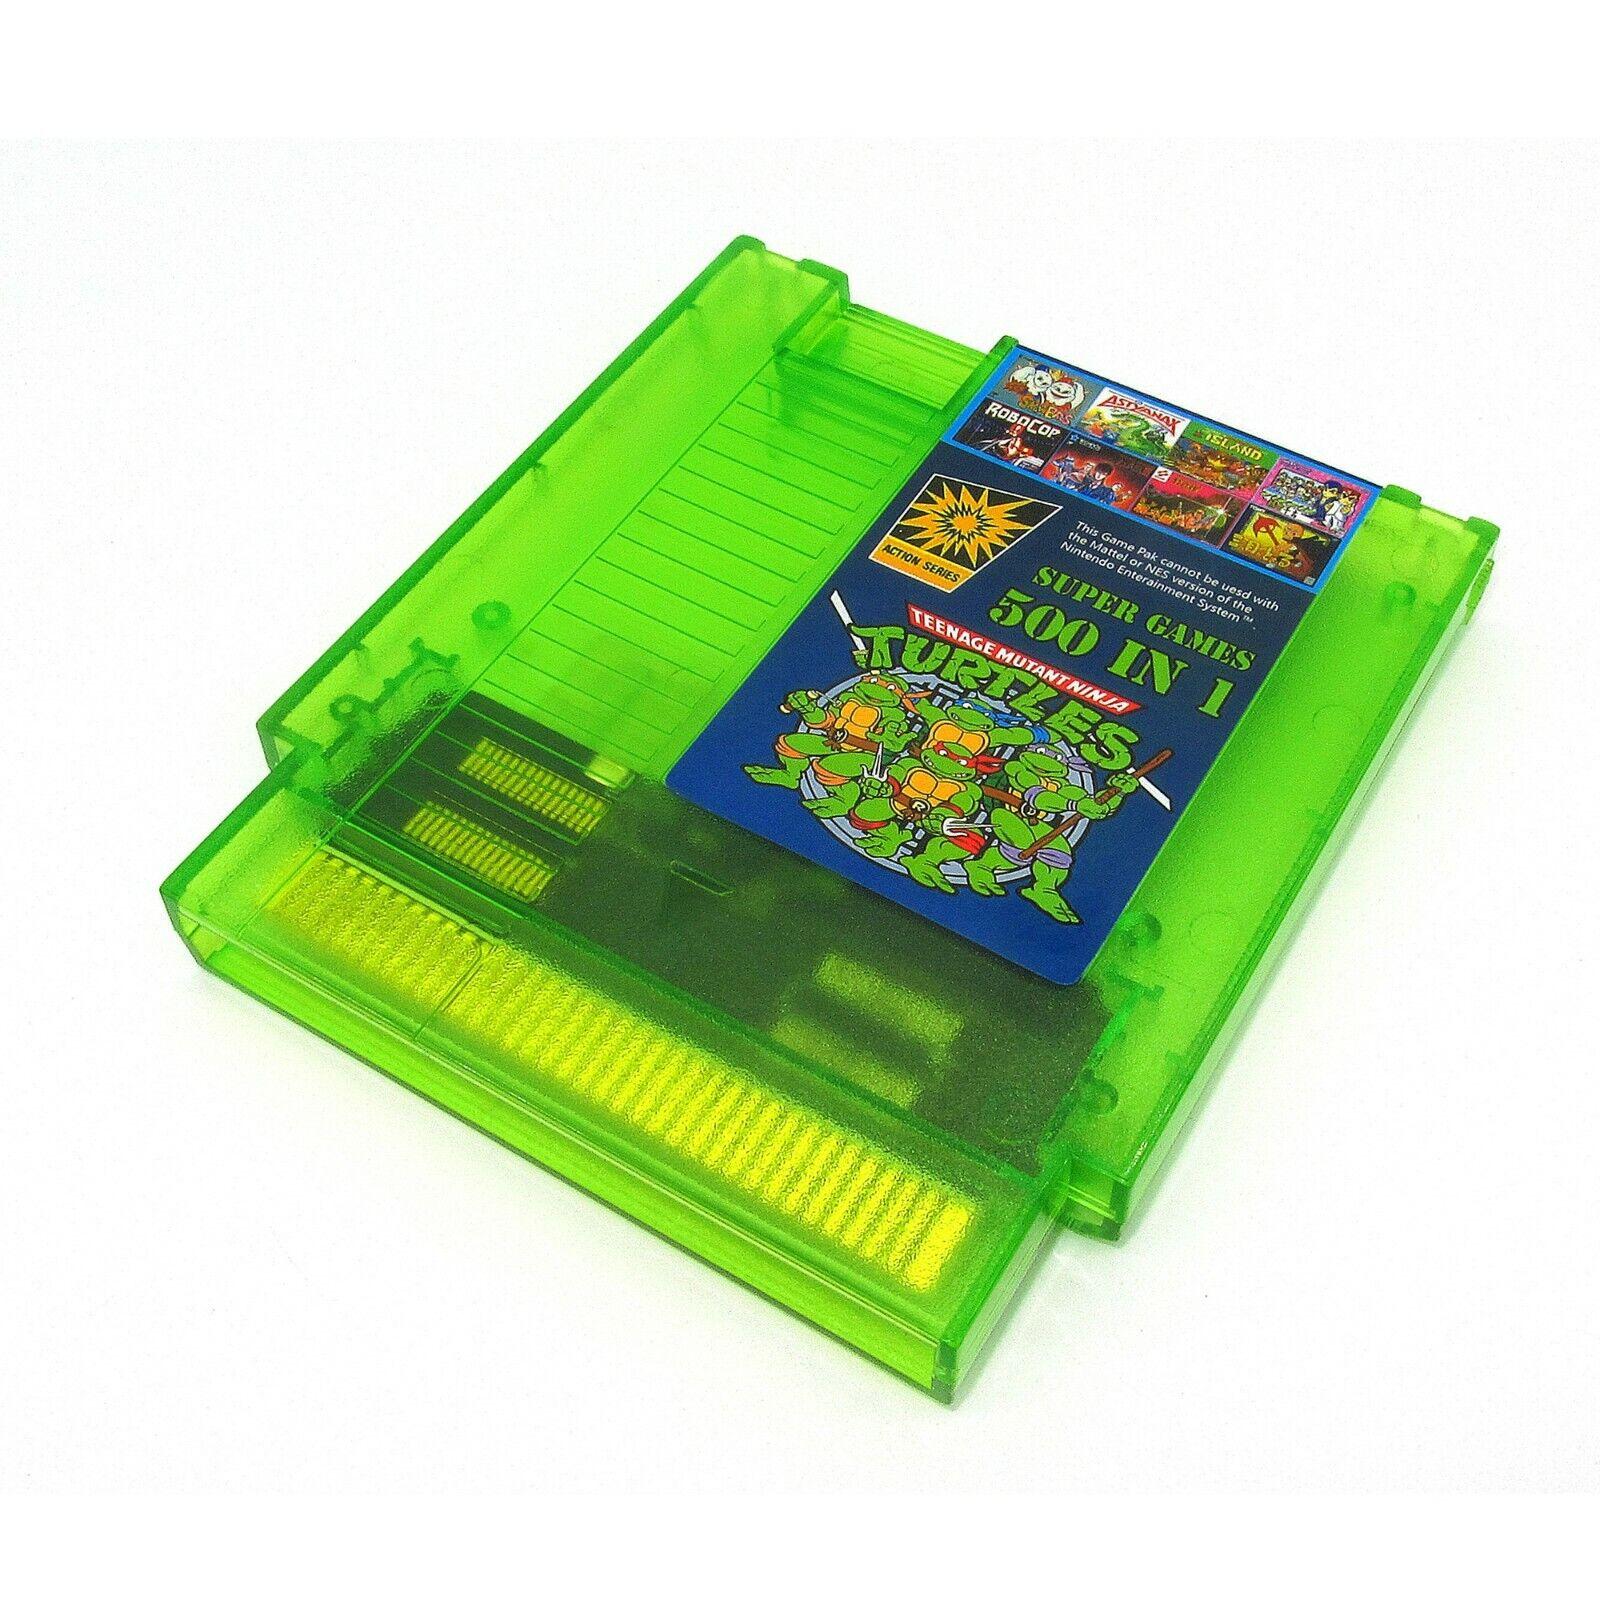 Super Games 500 in 1 Nintendo NES Cartridge Multicart - Newe